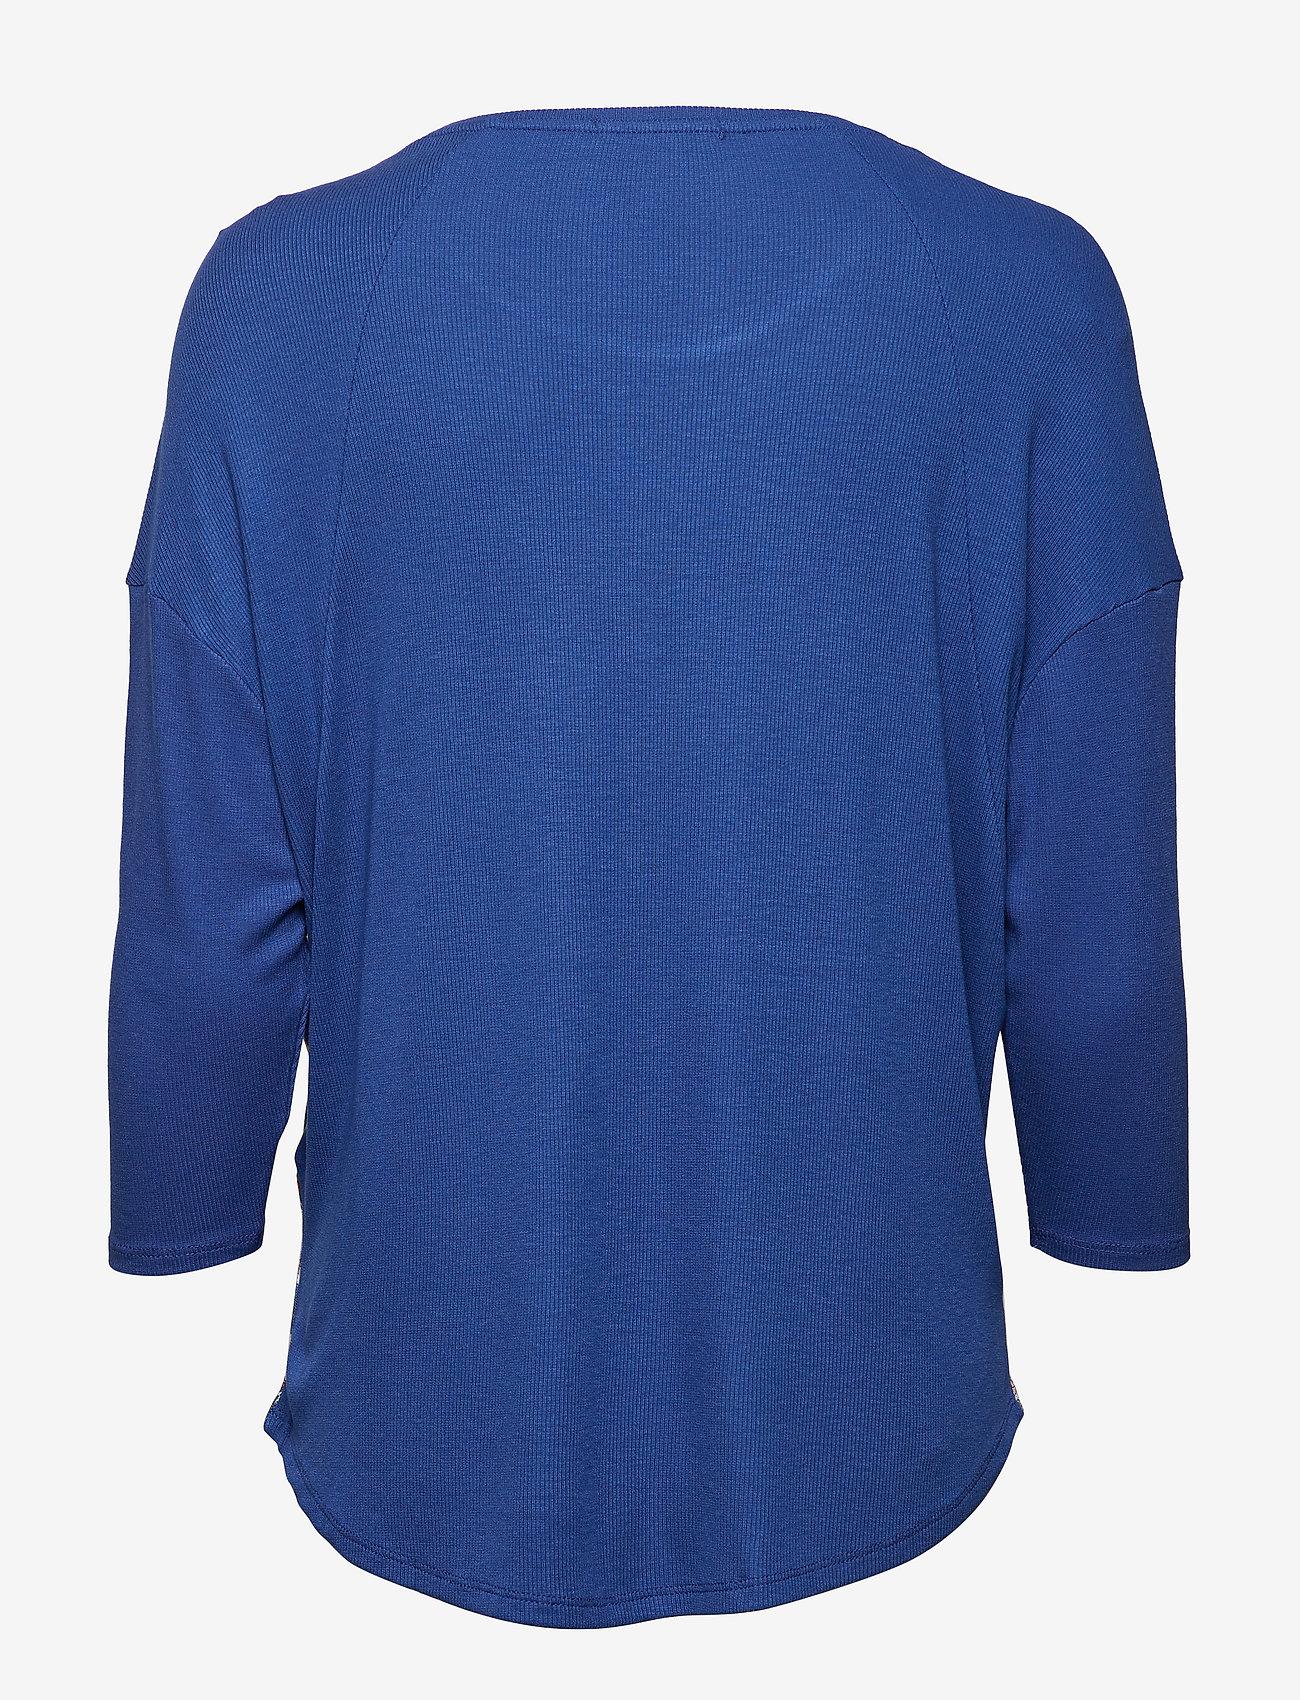 Ts Zita (Azul Menorca) (279.60 kr) - Desigual